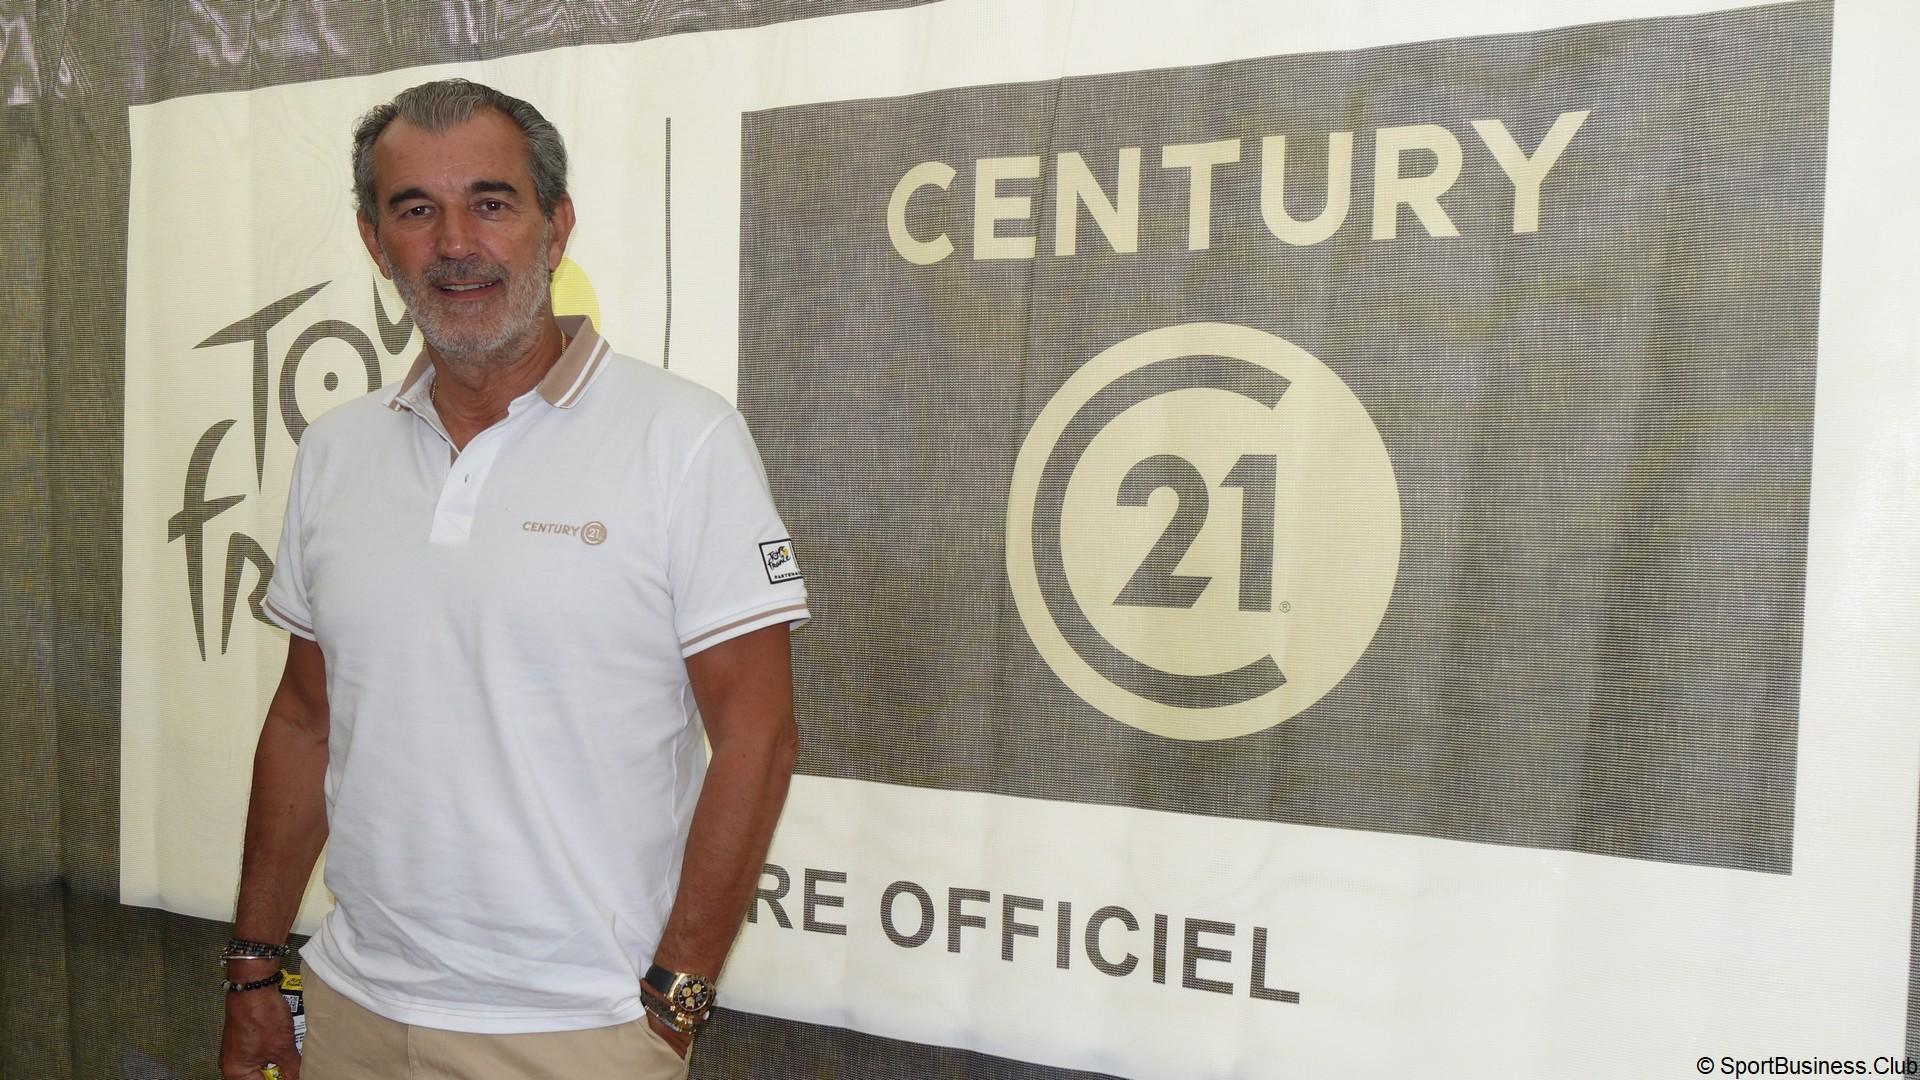 Vimont Laurent (1) Century 21